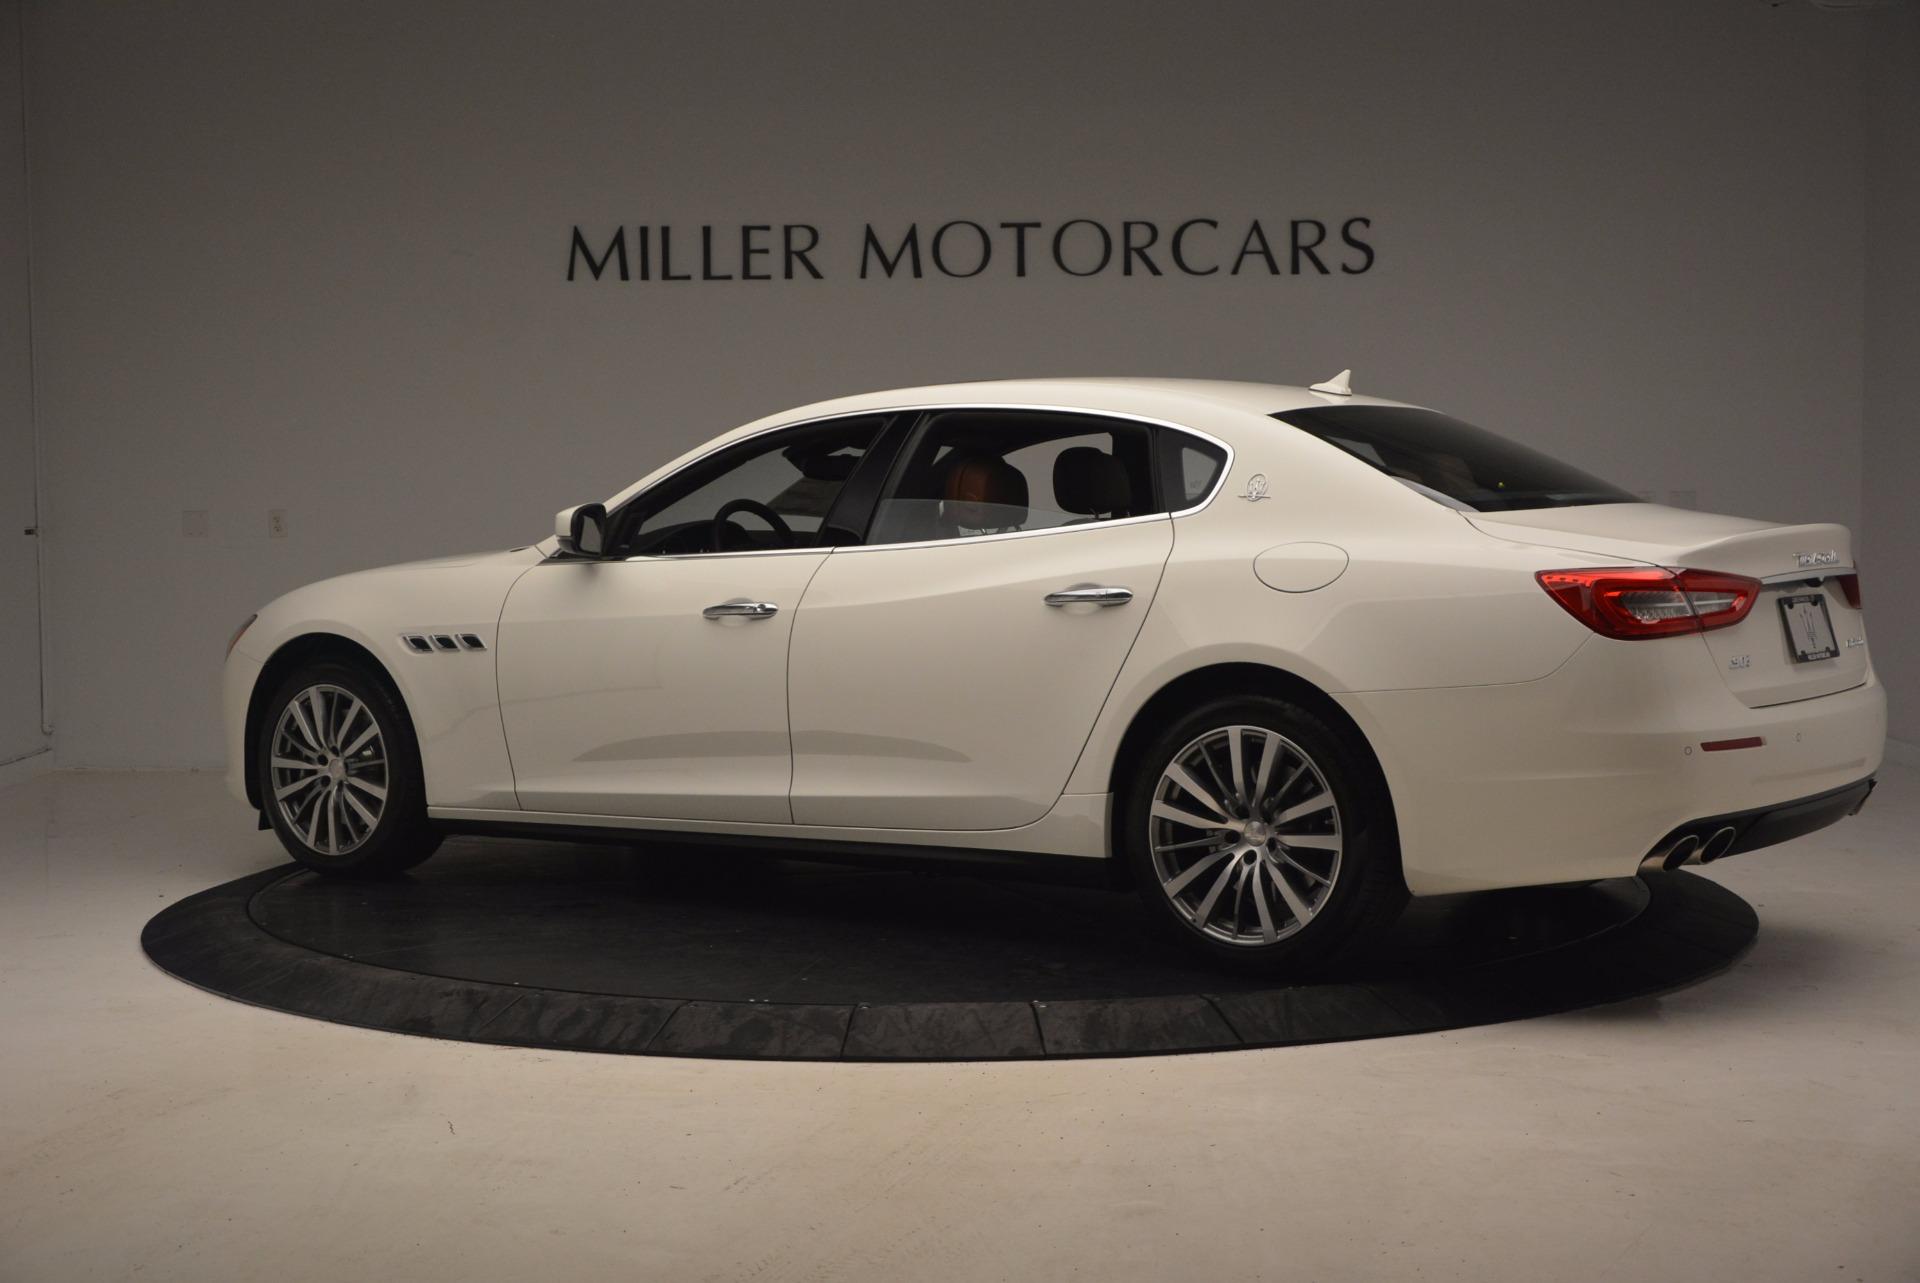 New 2017 Maserati Quattroporte SQ4 For Sale In Westport, CT 1065_p4